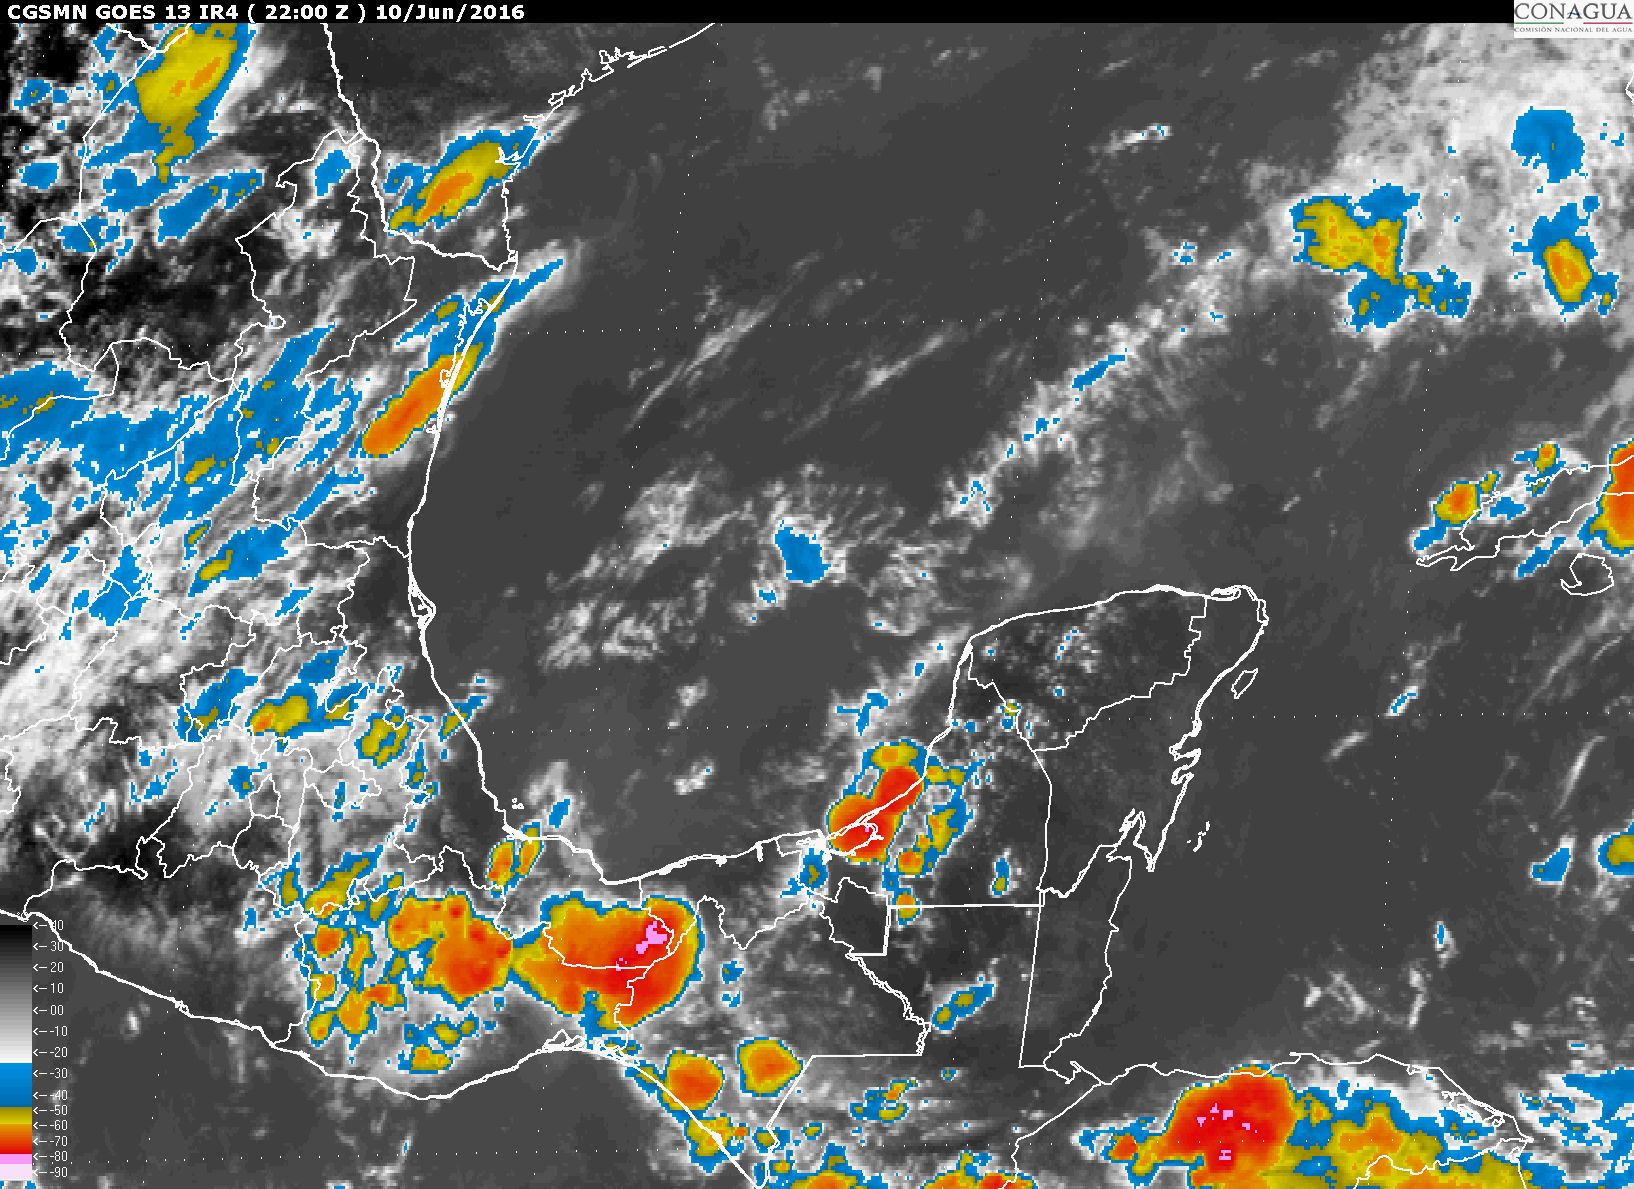 Onda tropical favorecerá lluvias el sábado